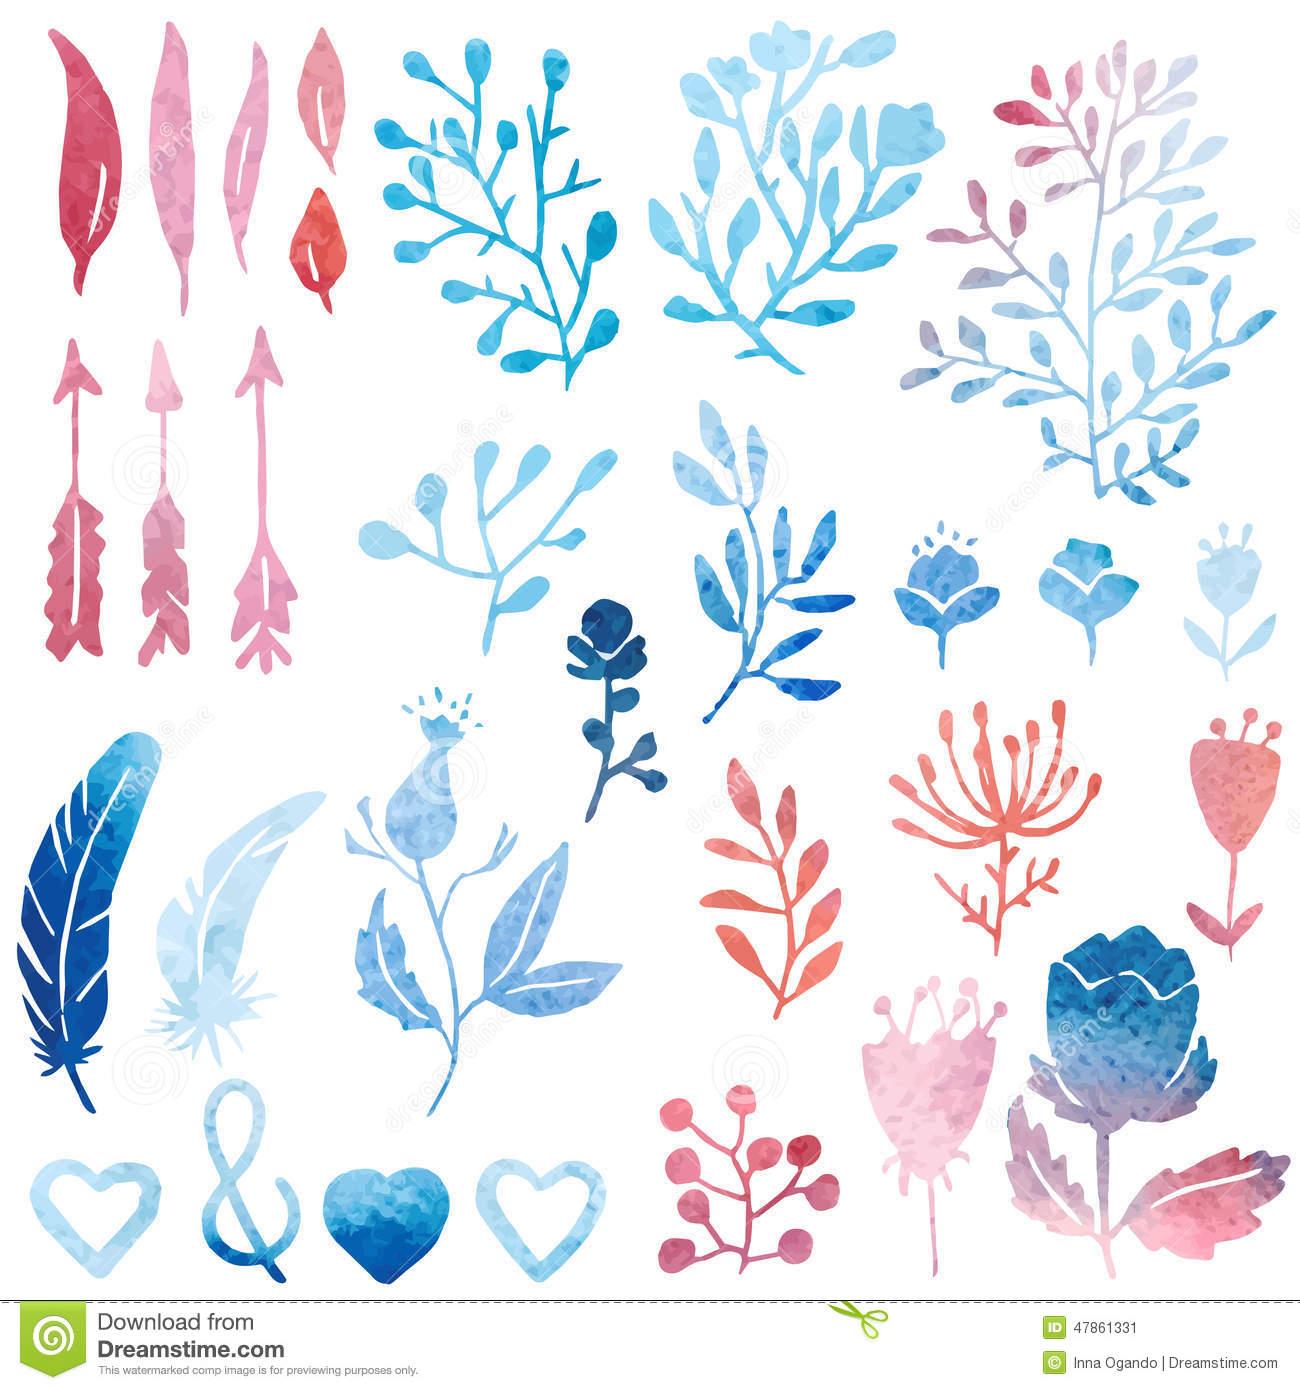 Watercolor Clipart & Watercolor Clip Art Images.